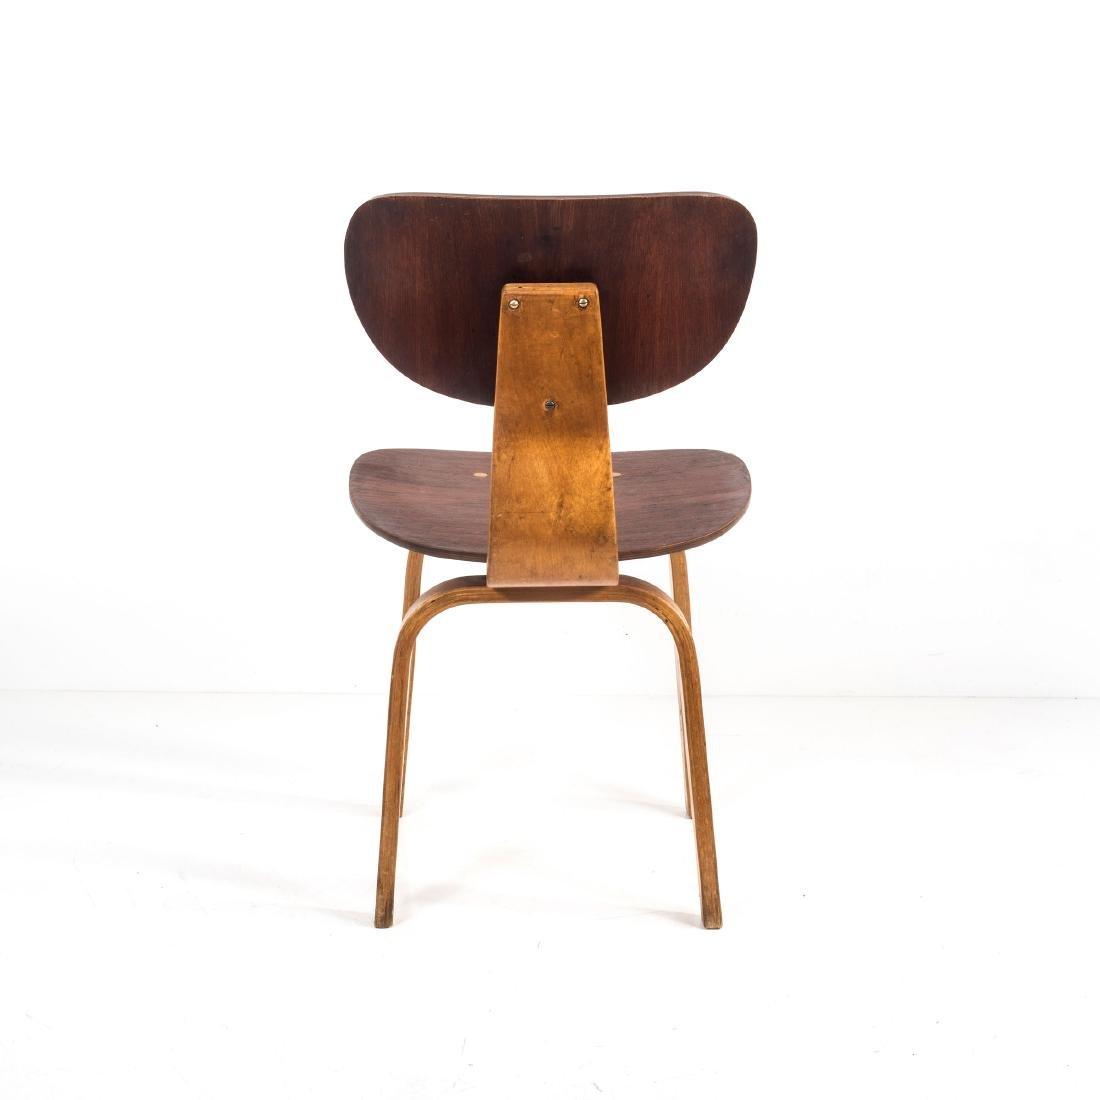 Four 'SB16' chairs, 1955 - 9